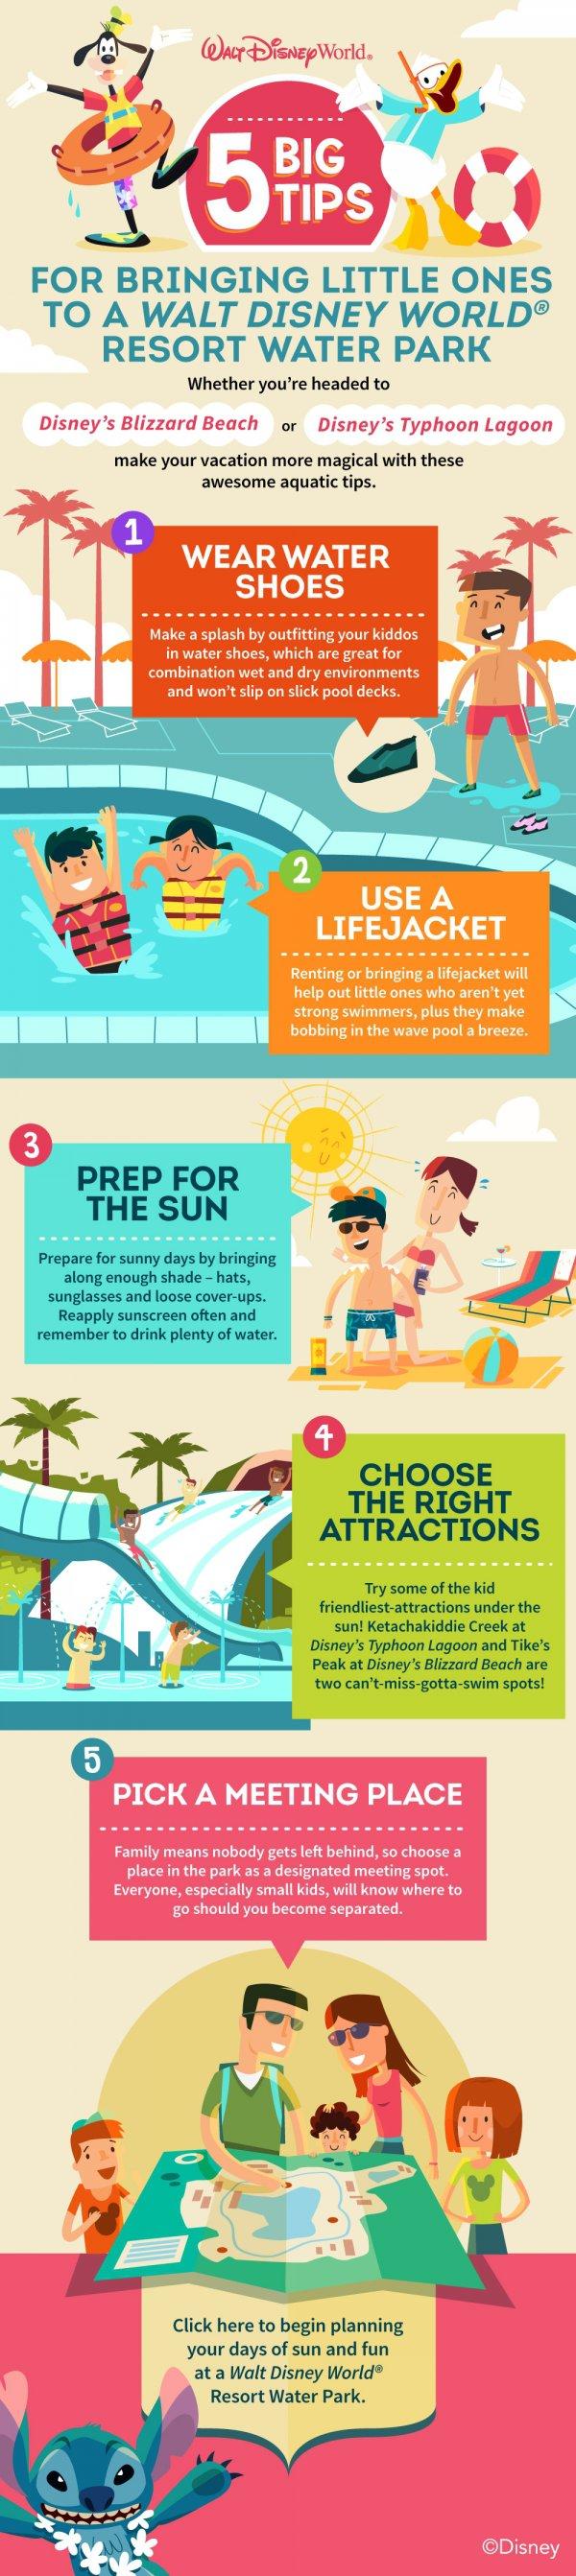 5 Big Tips for Bringing Little Ones to a Walt Disney World Resort Water Park